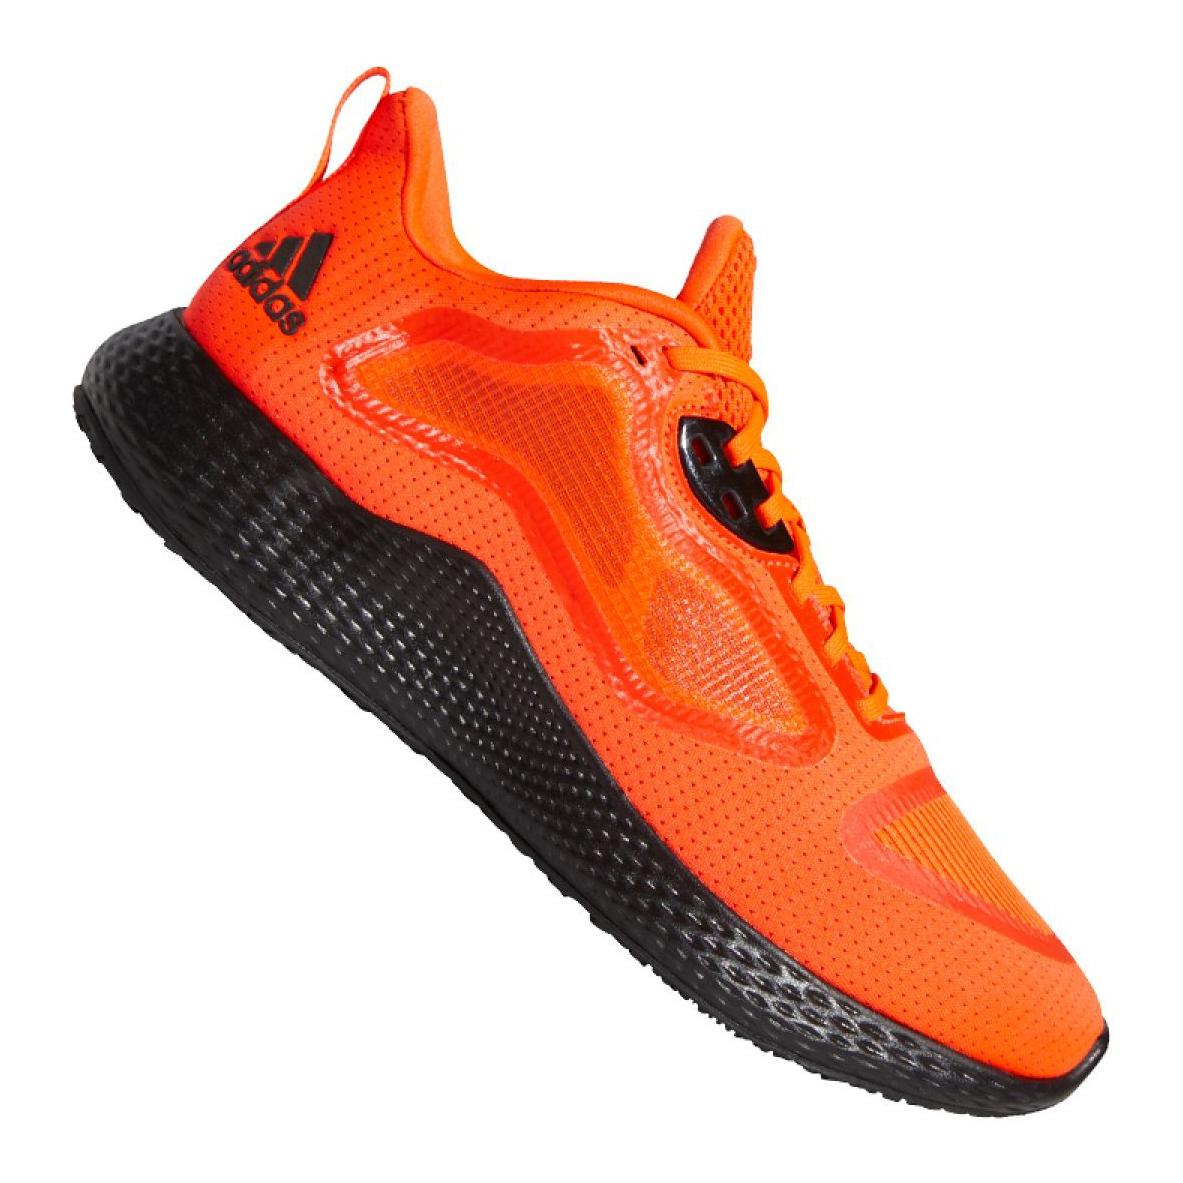 Adidas Edge Rc M EG1411 running shoes orange